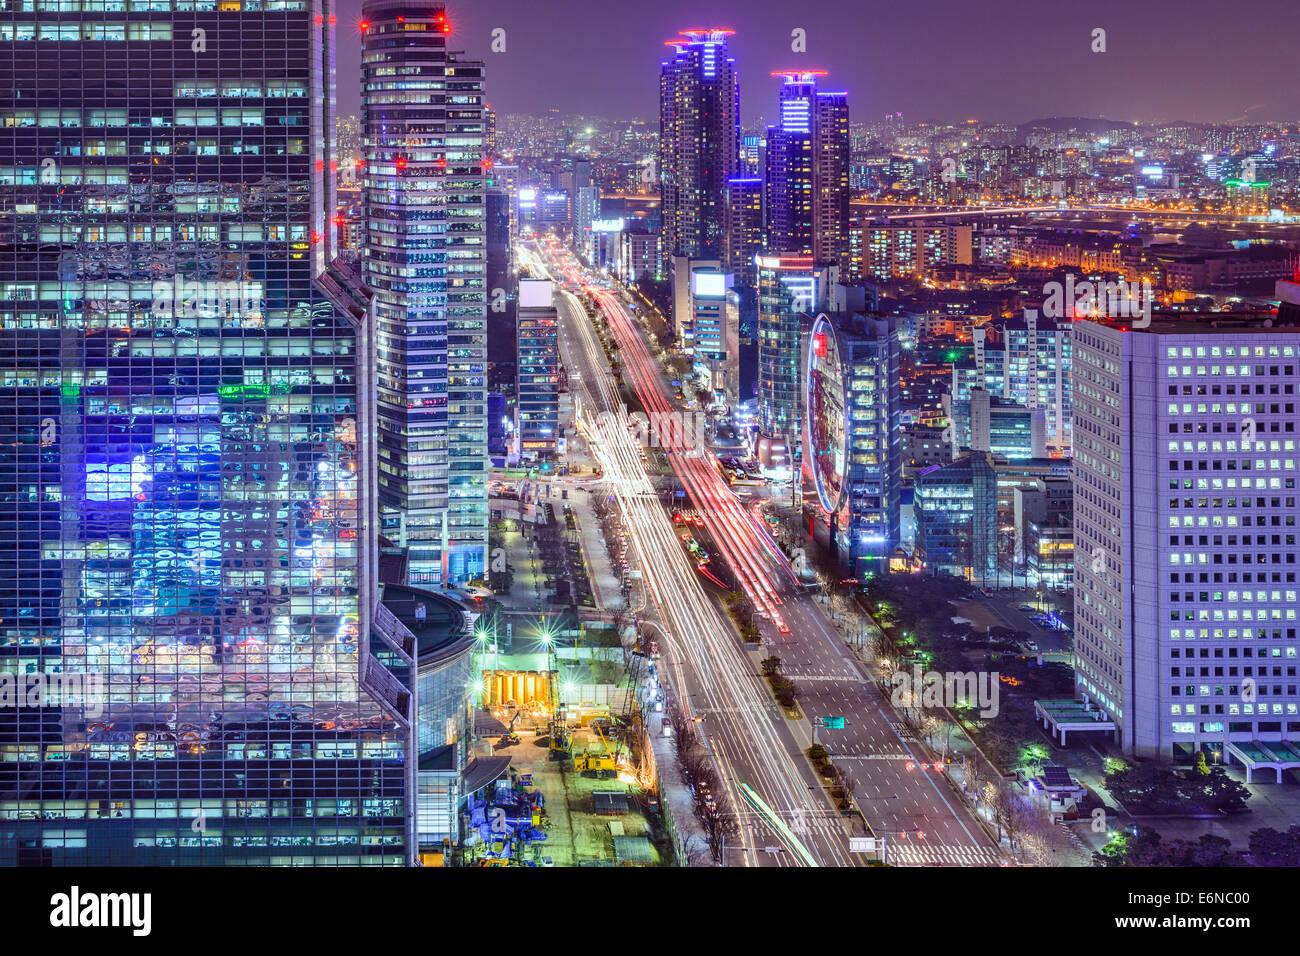 Seoul, South Korea cityscape at Teheranno District at night. Stock Photo